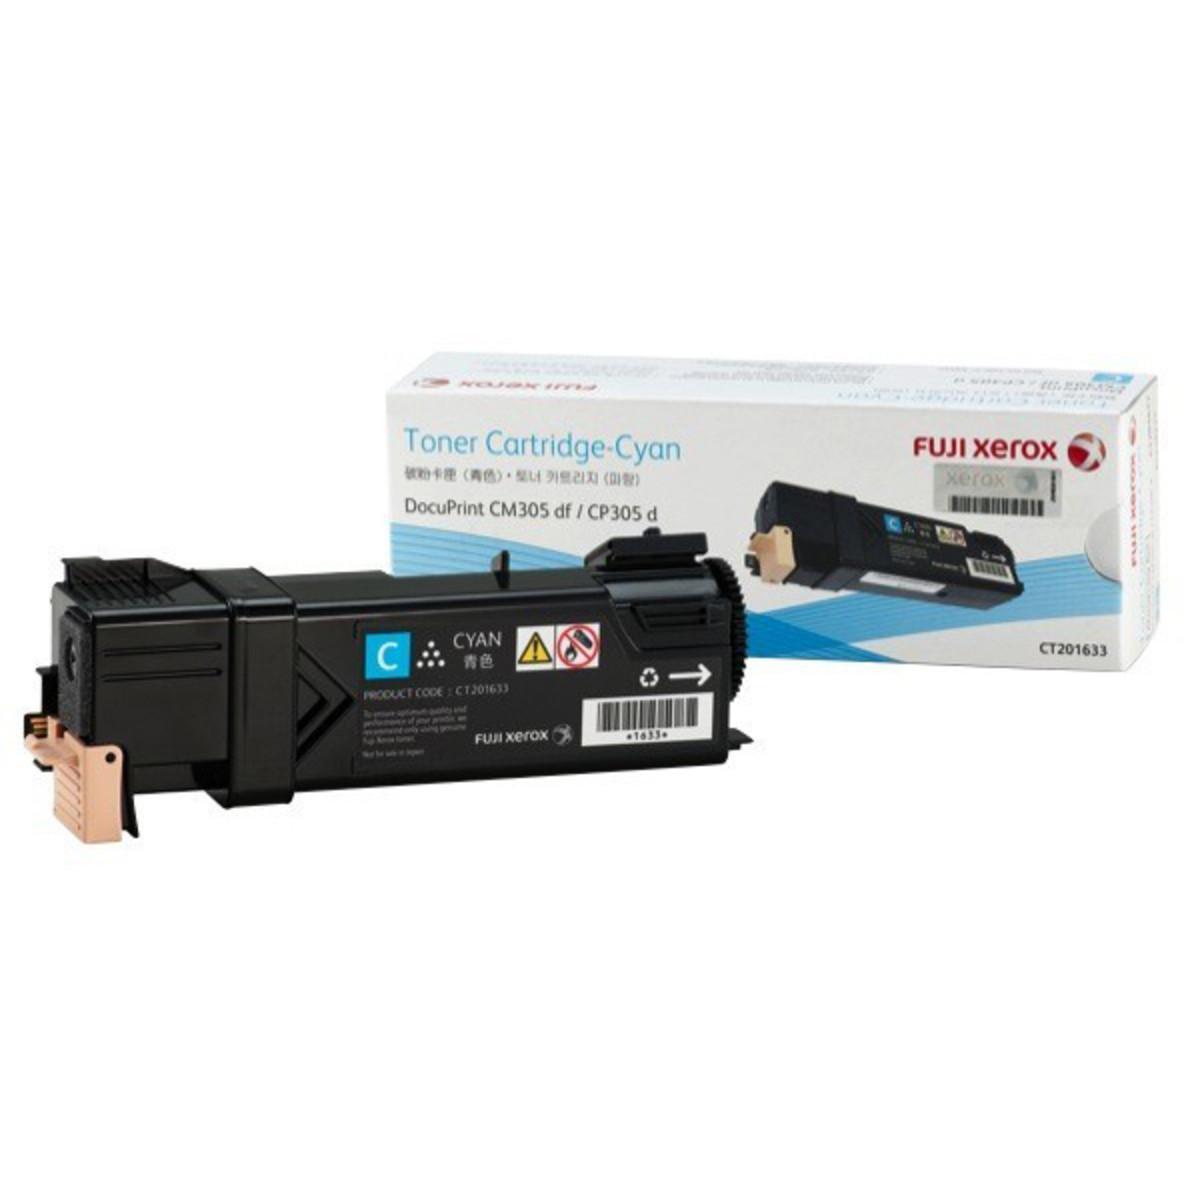 Xerox CT201633 Cyan Toner Cartridge